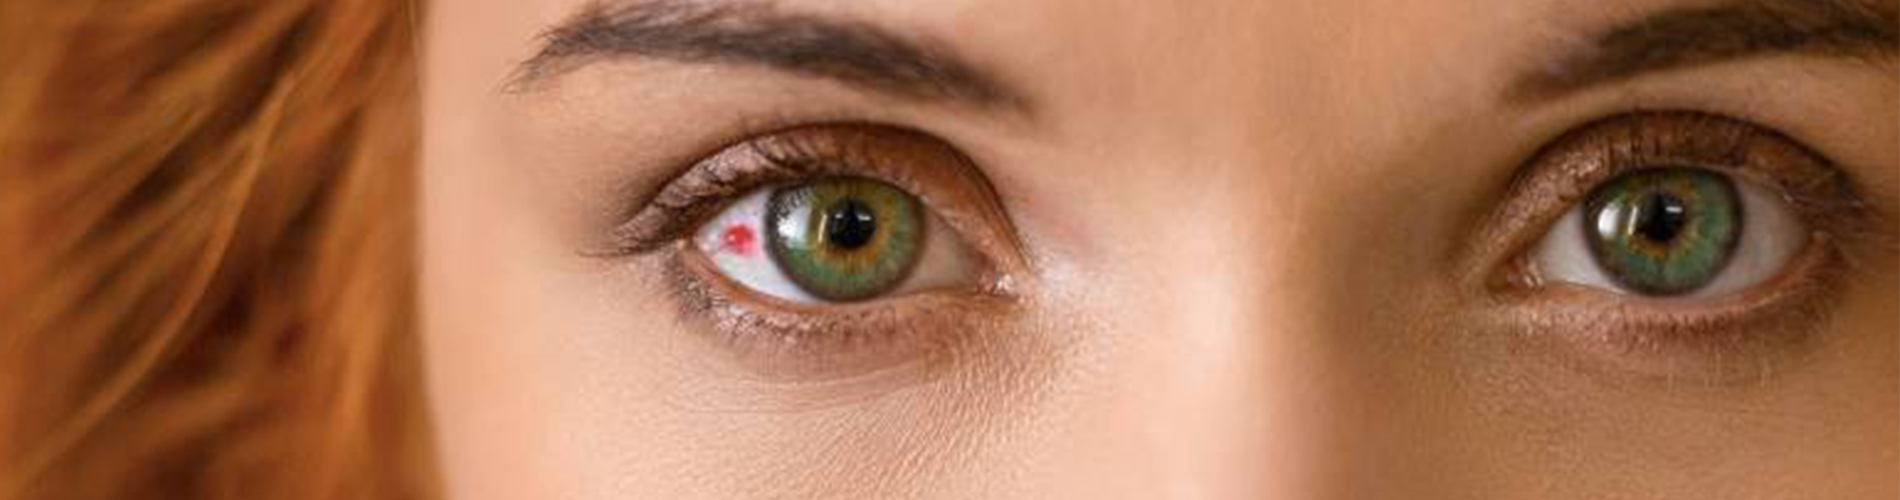 manchas oculares